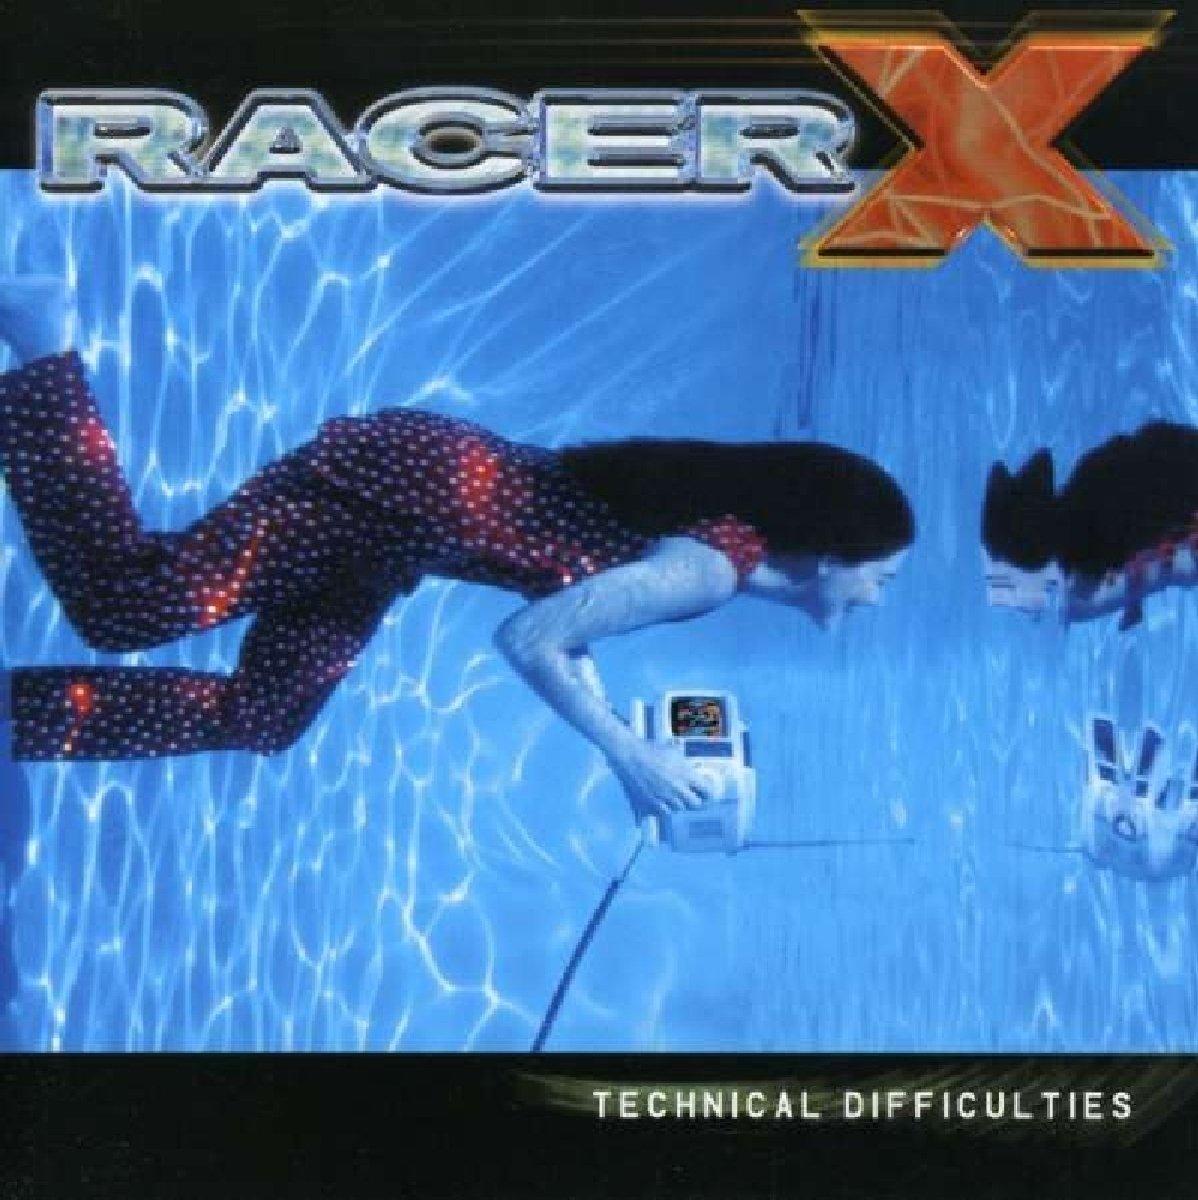 Racer X - Technical Difficulties (CD)